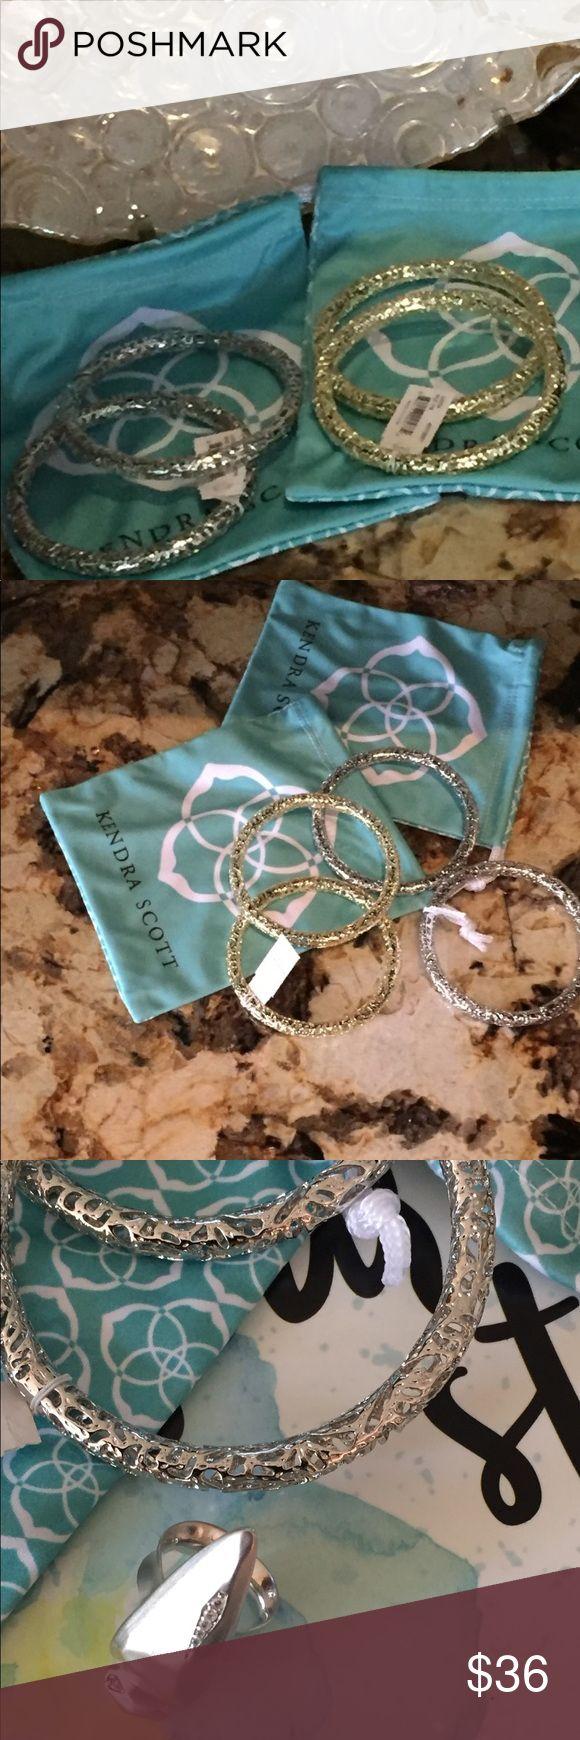 "🍭Silver Kendra Scott Lucca Bangle Bracelet 🍃Gorgeous silver Kendra Scott filigree bangle bracelet.🌱                       ▪️8"" circumference                                  ▪️1/4 width Kendra Scott Jewelry Bracelets"